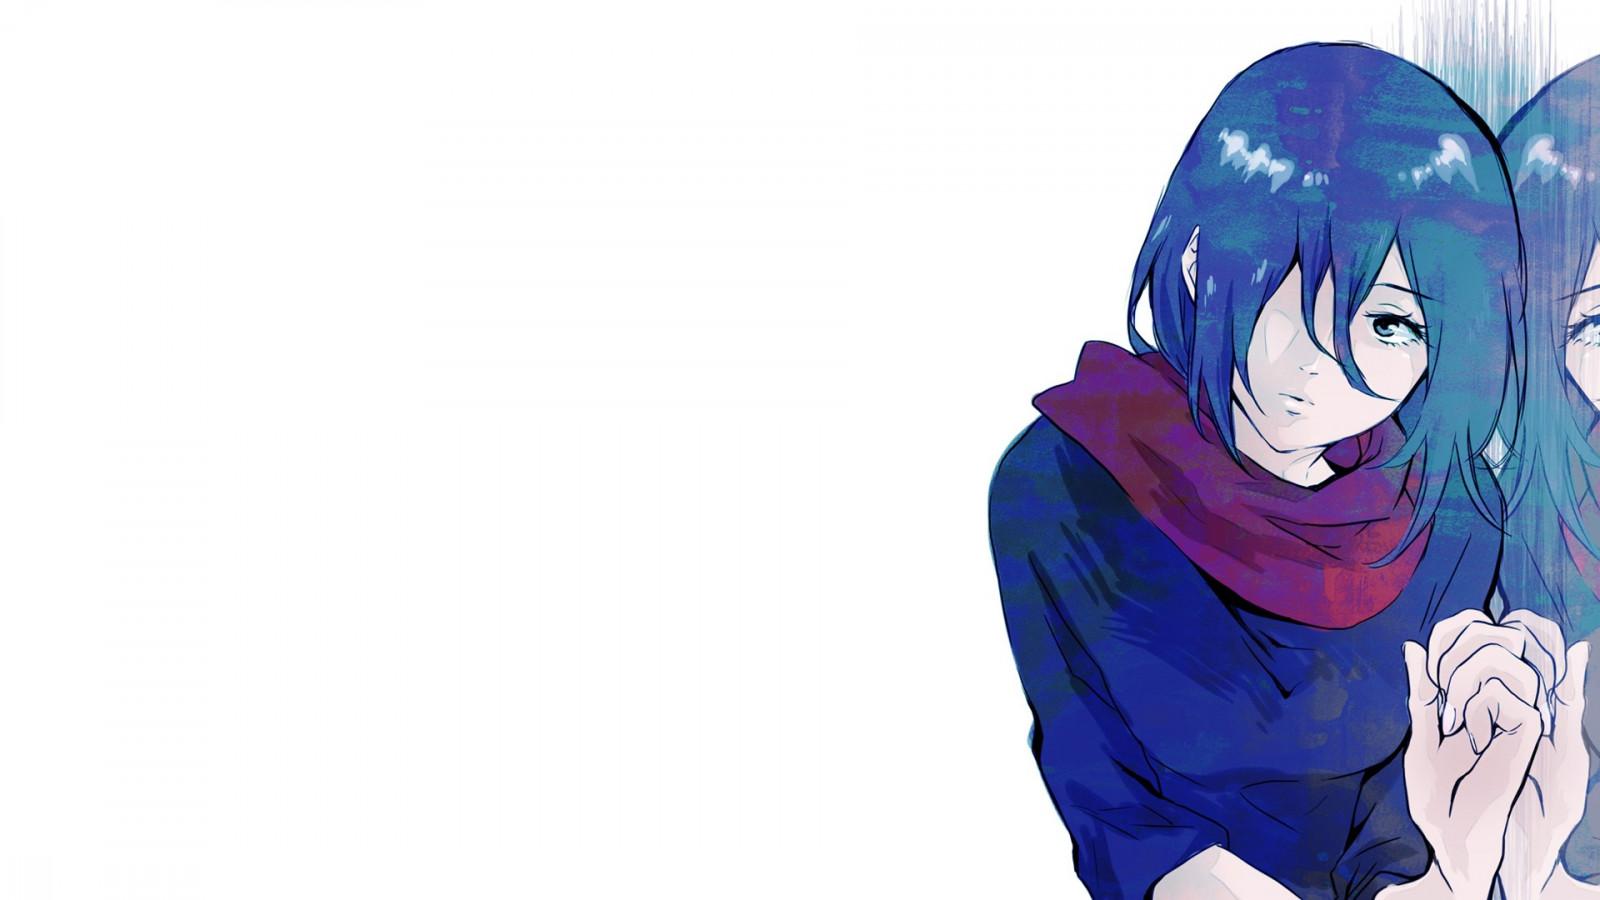 Fond D Ecran Illustration Anime Filles Anime Violet Bleu